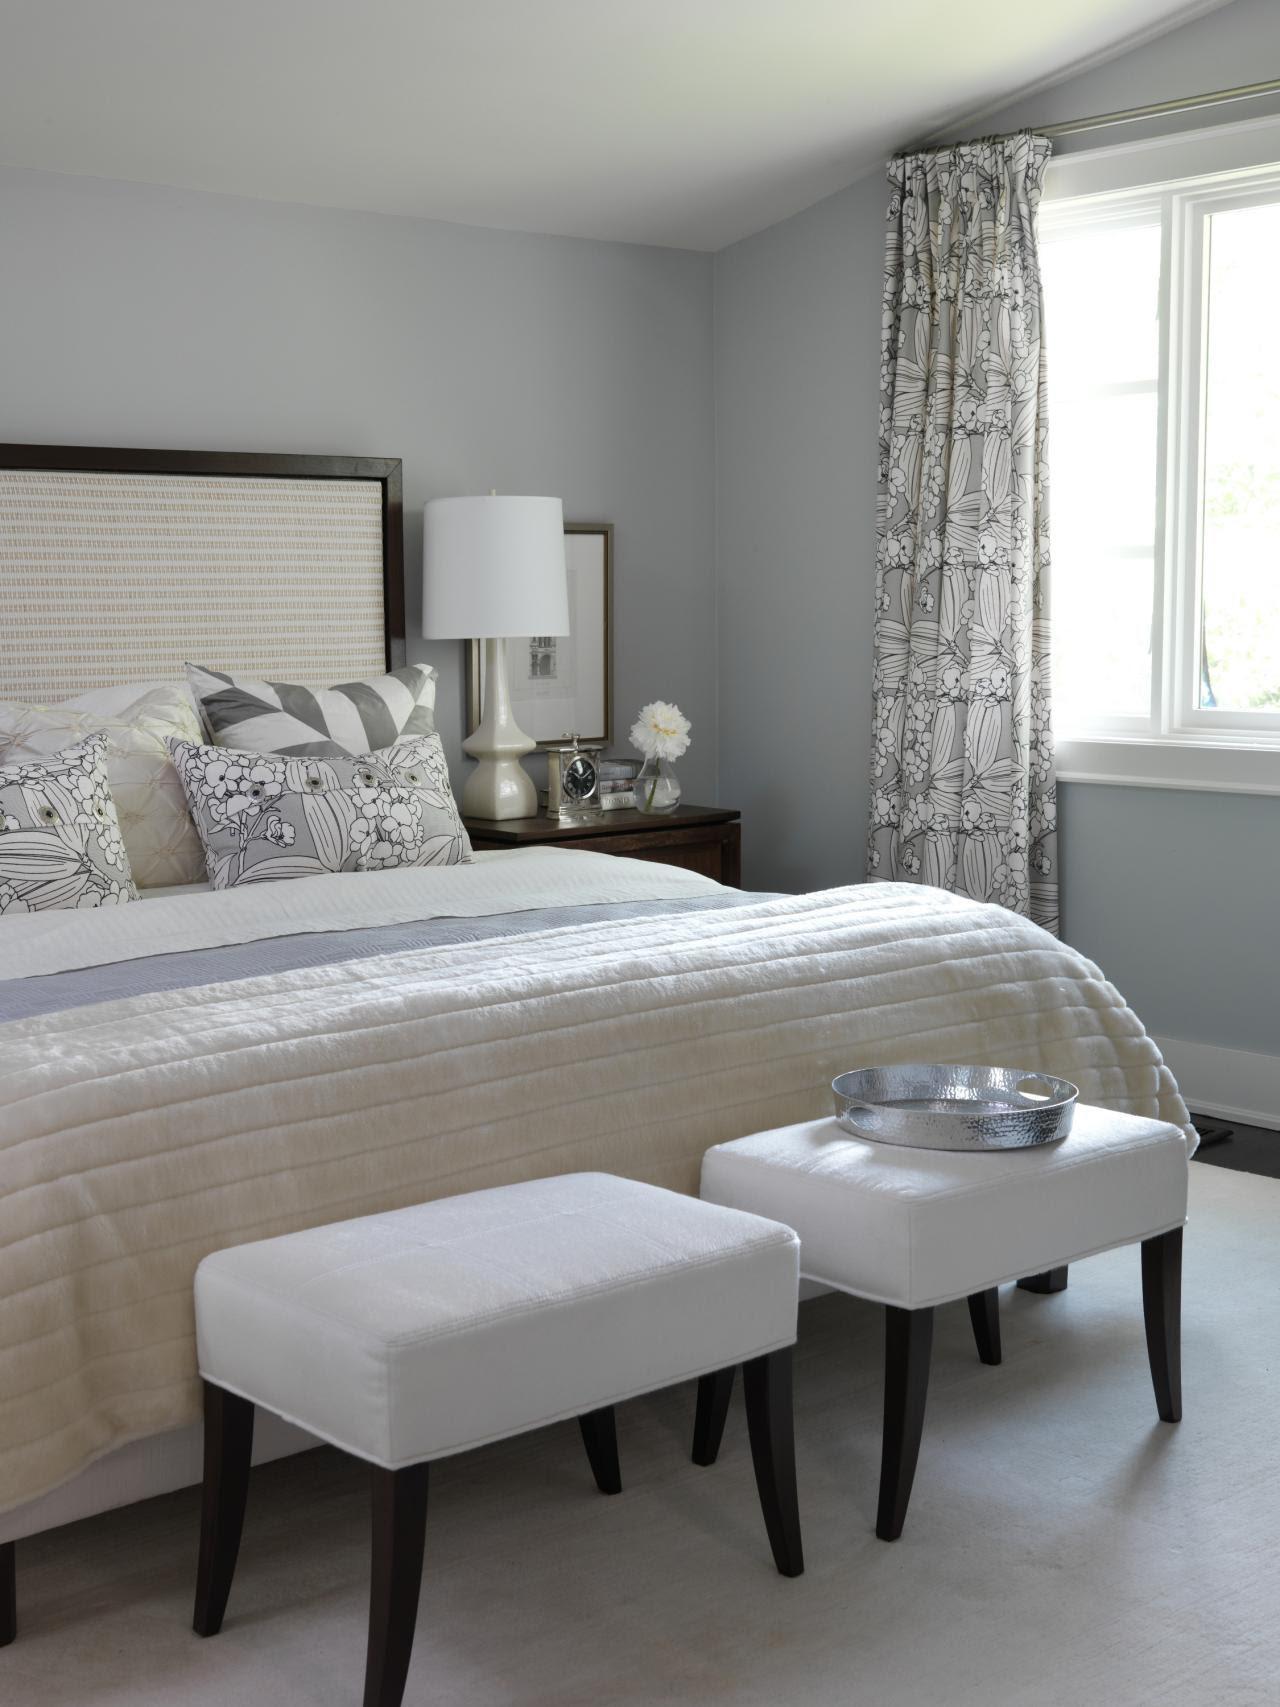 Stylish, Sexy Bedrooms  Bedrooms  Bedroom Decorating Ideas  HGTV